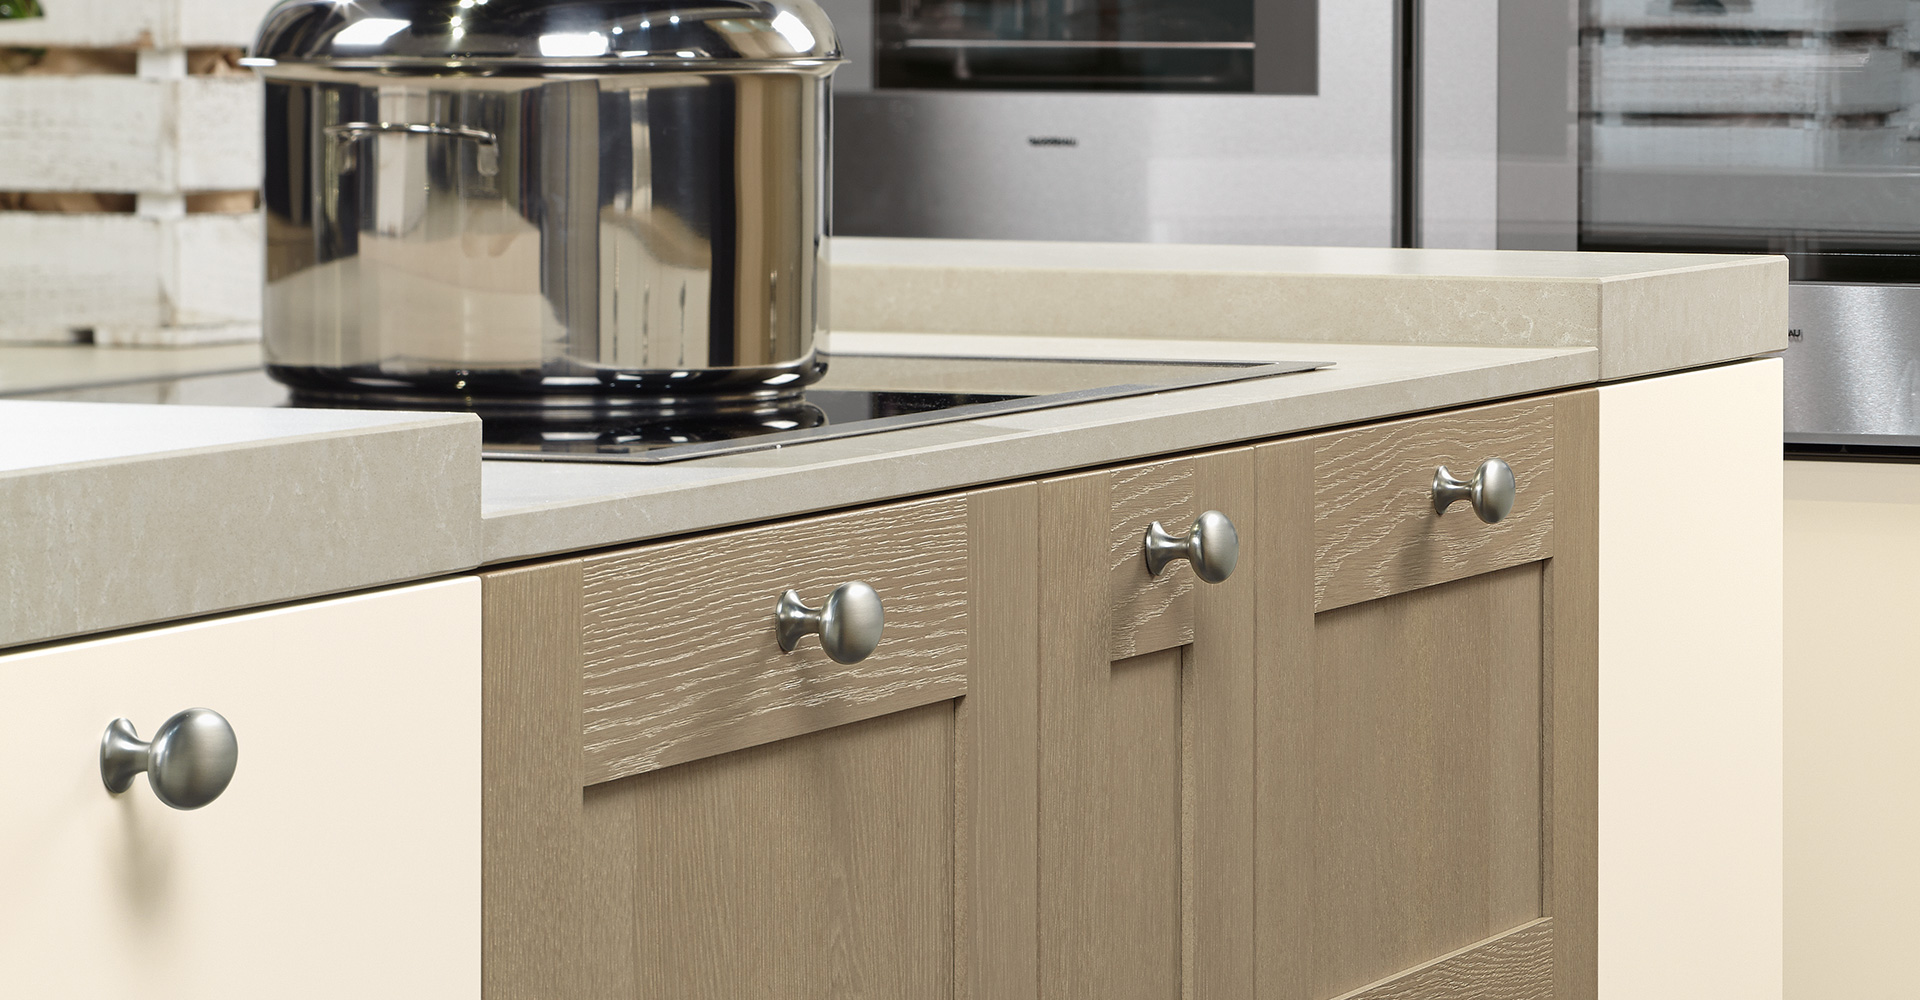 Keuken configurator keuken culemborg keuken decoratie ideeen keuken frontjes keuken gadgets - Keuken decoratie ideeen ...